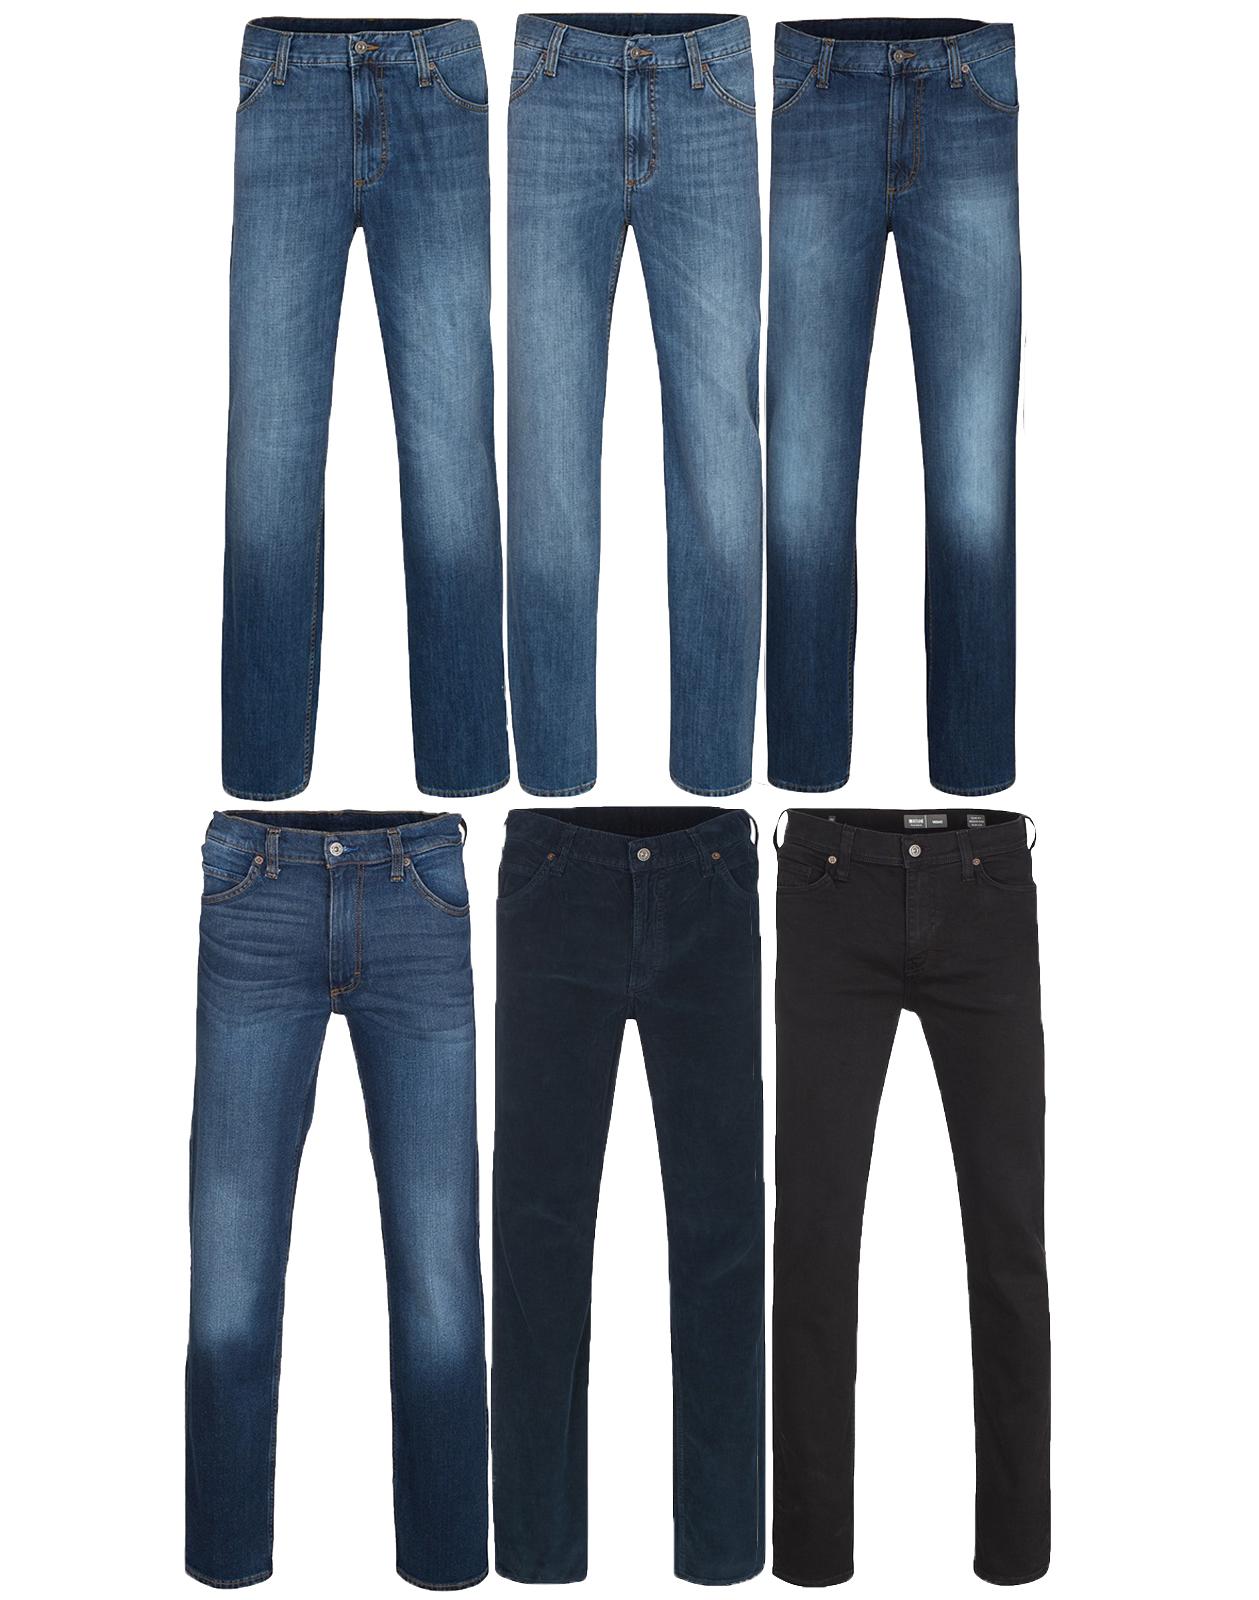 eBay WOW - MUSTANG Oklahoma, Tramper oder Vegas Jeans für 29,99€